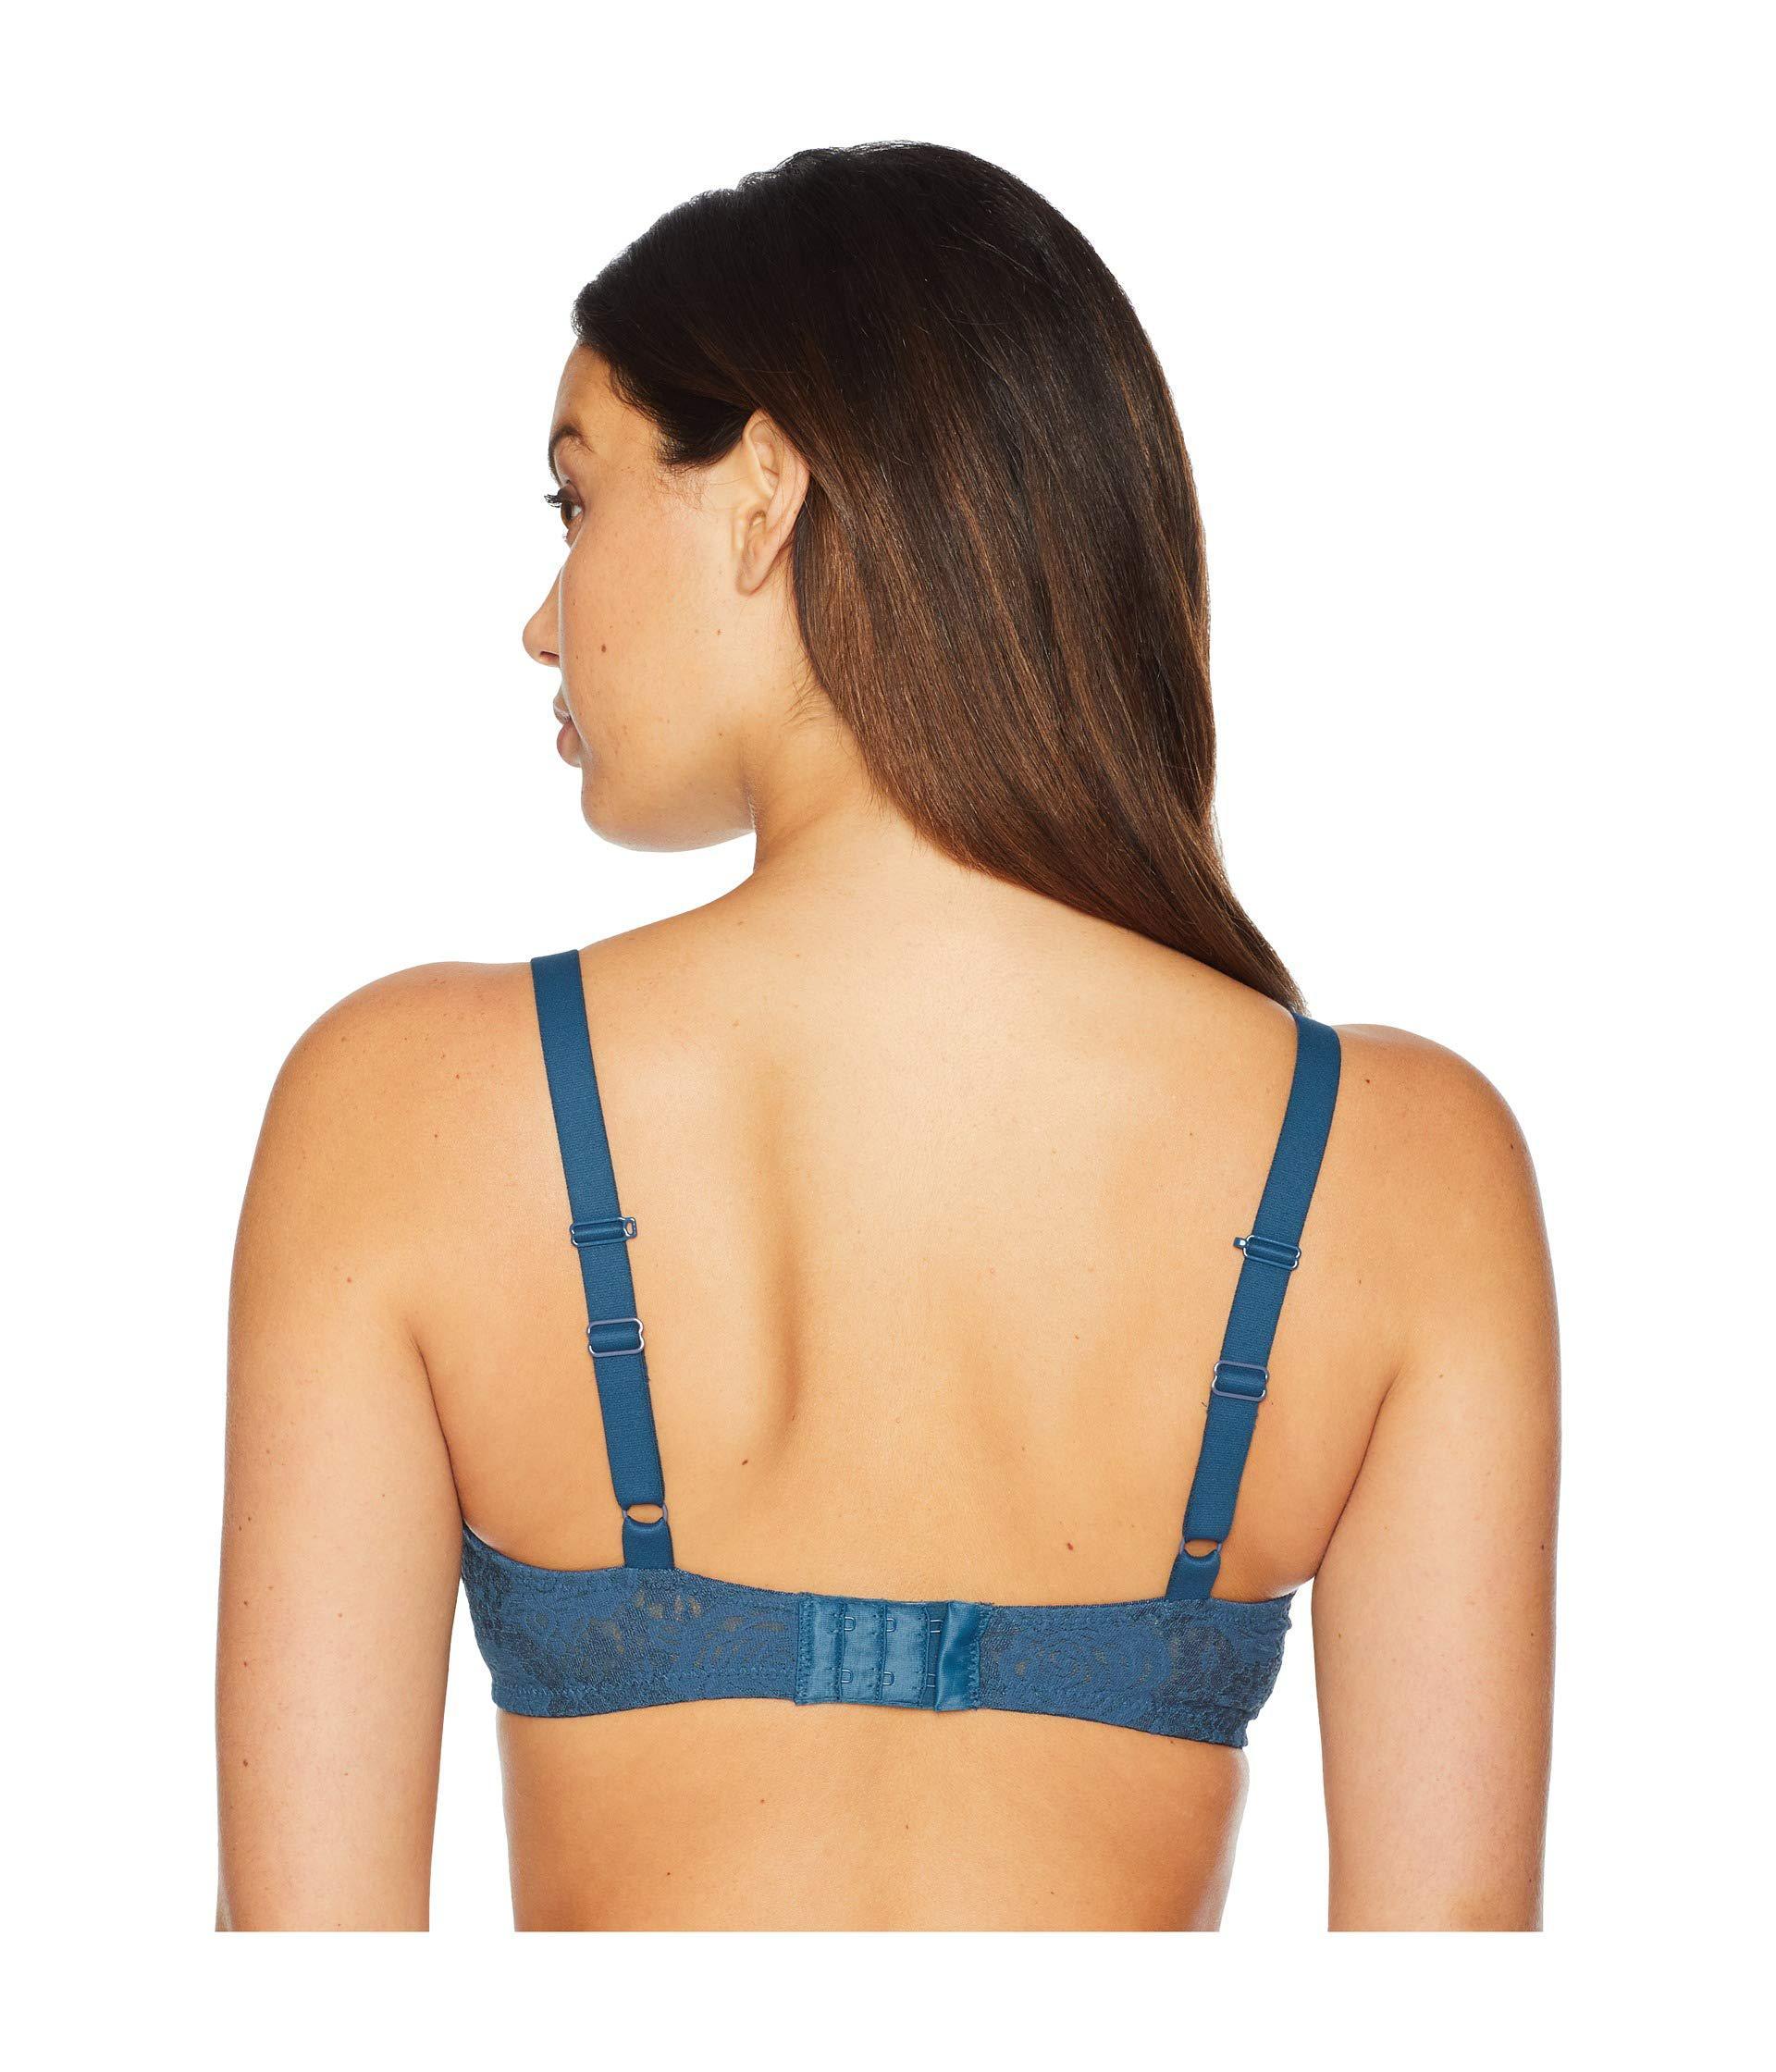 c7030668499e7 Wacoal - Blue Halo Lace Underwire Bra 851205 - Lyst. View fullscreen